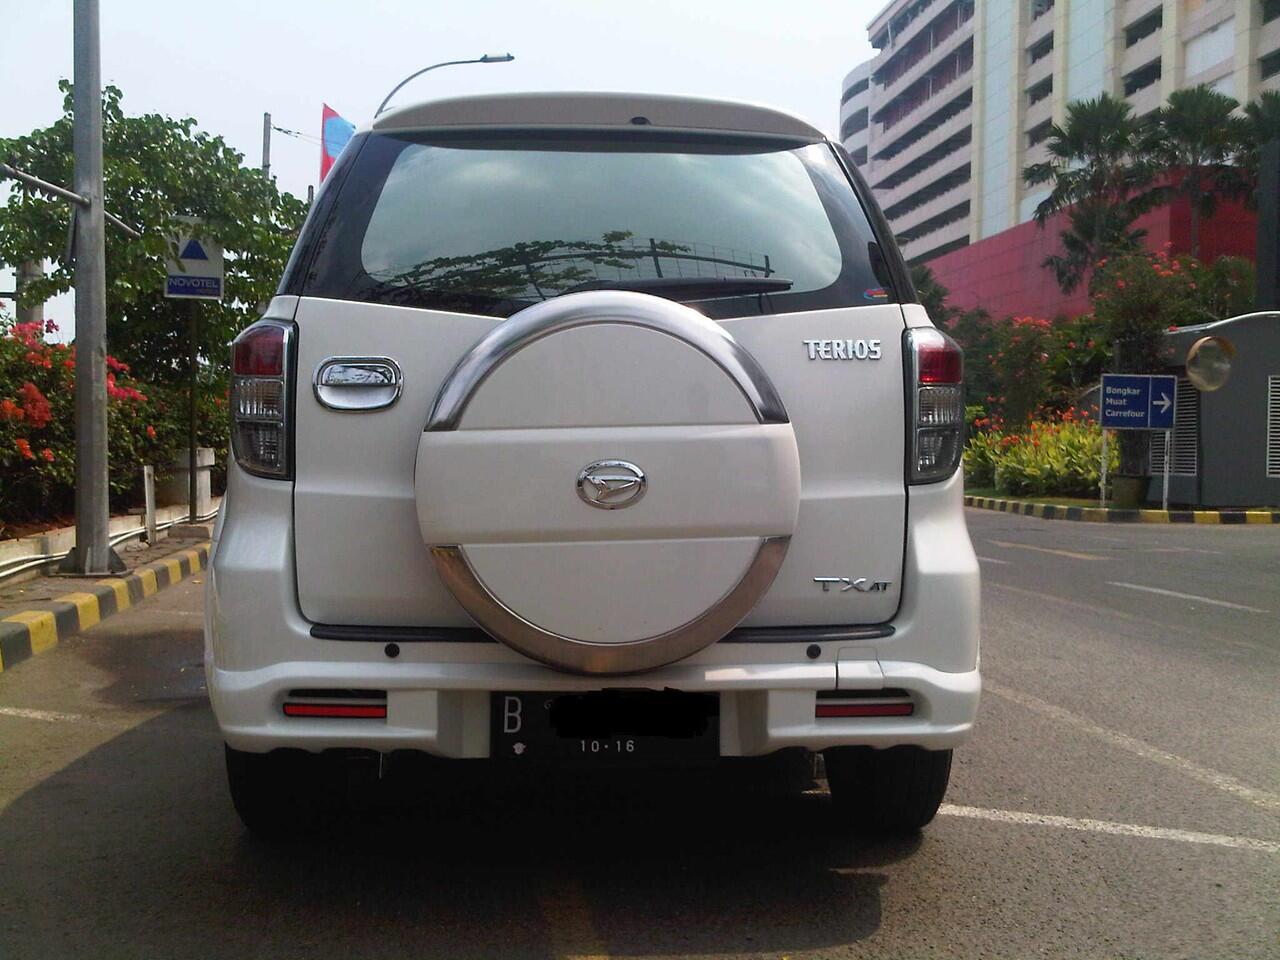 [WTS] Daihatsu Terios TX Adventure 2011 Putih A/T Like New